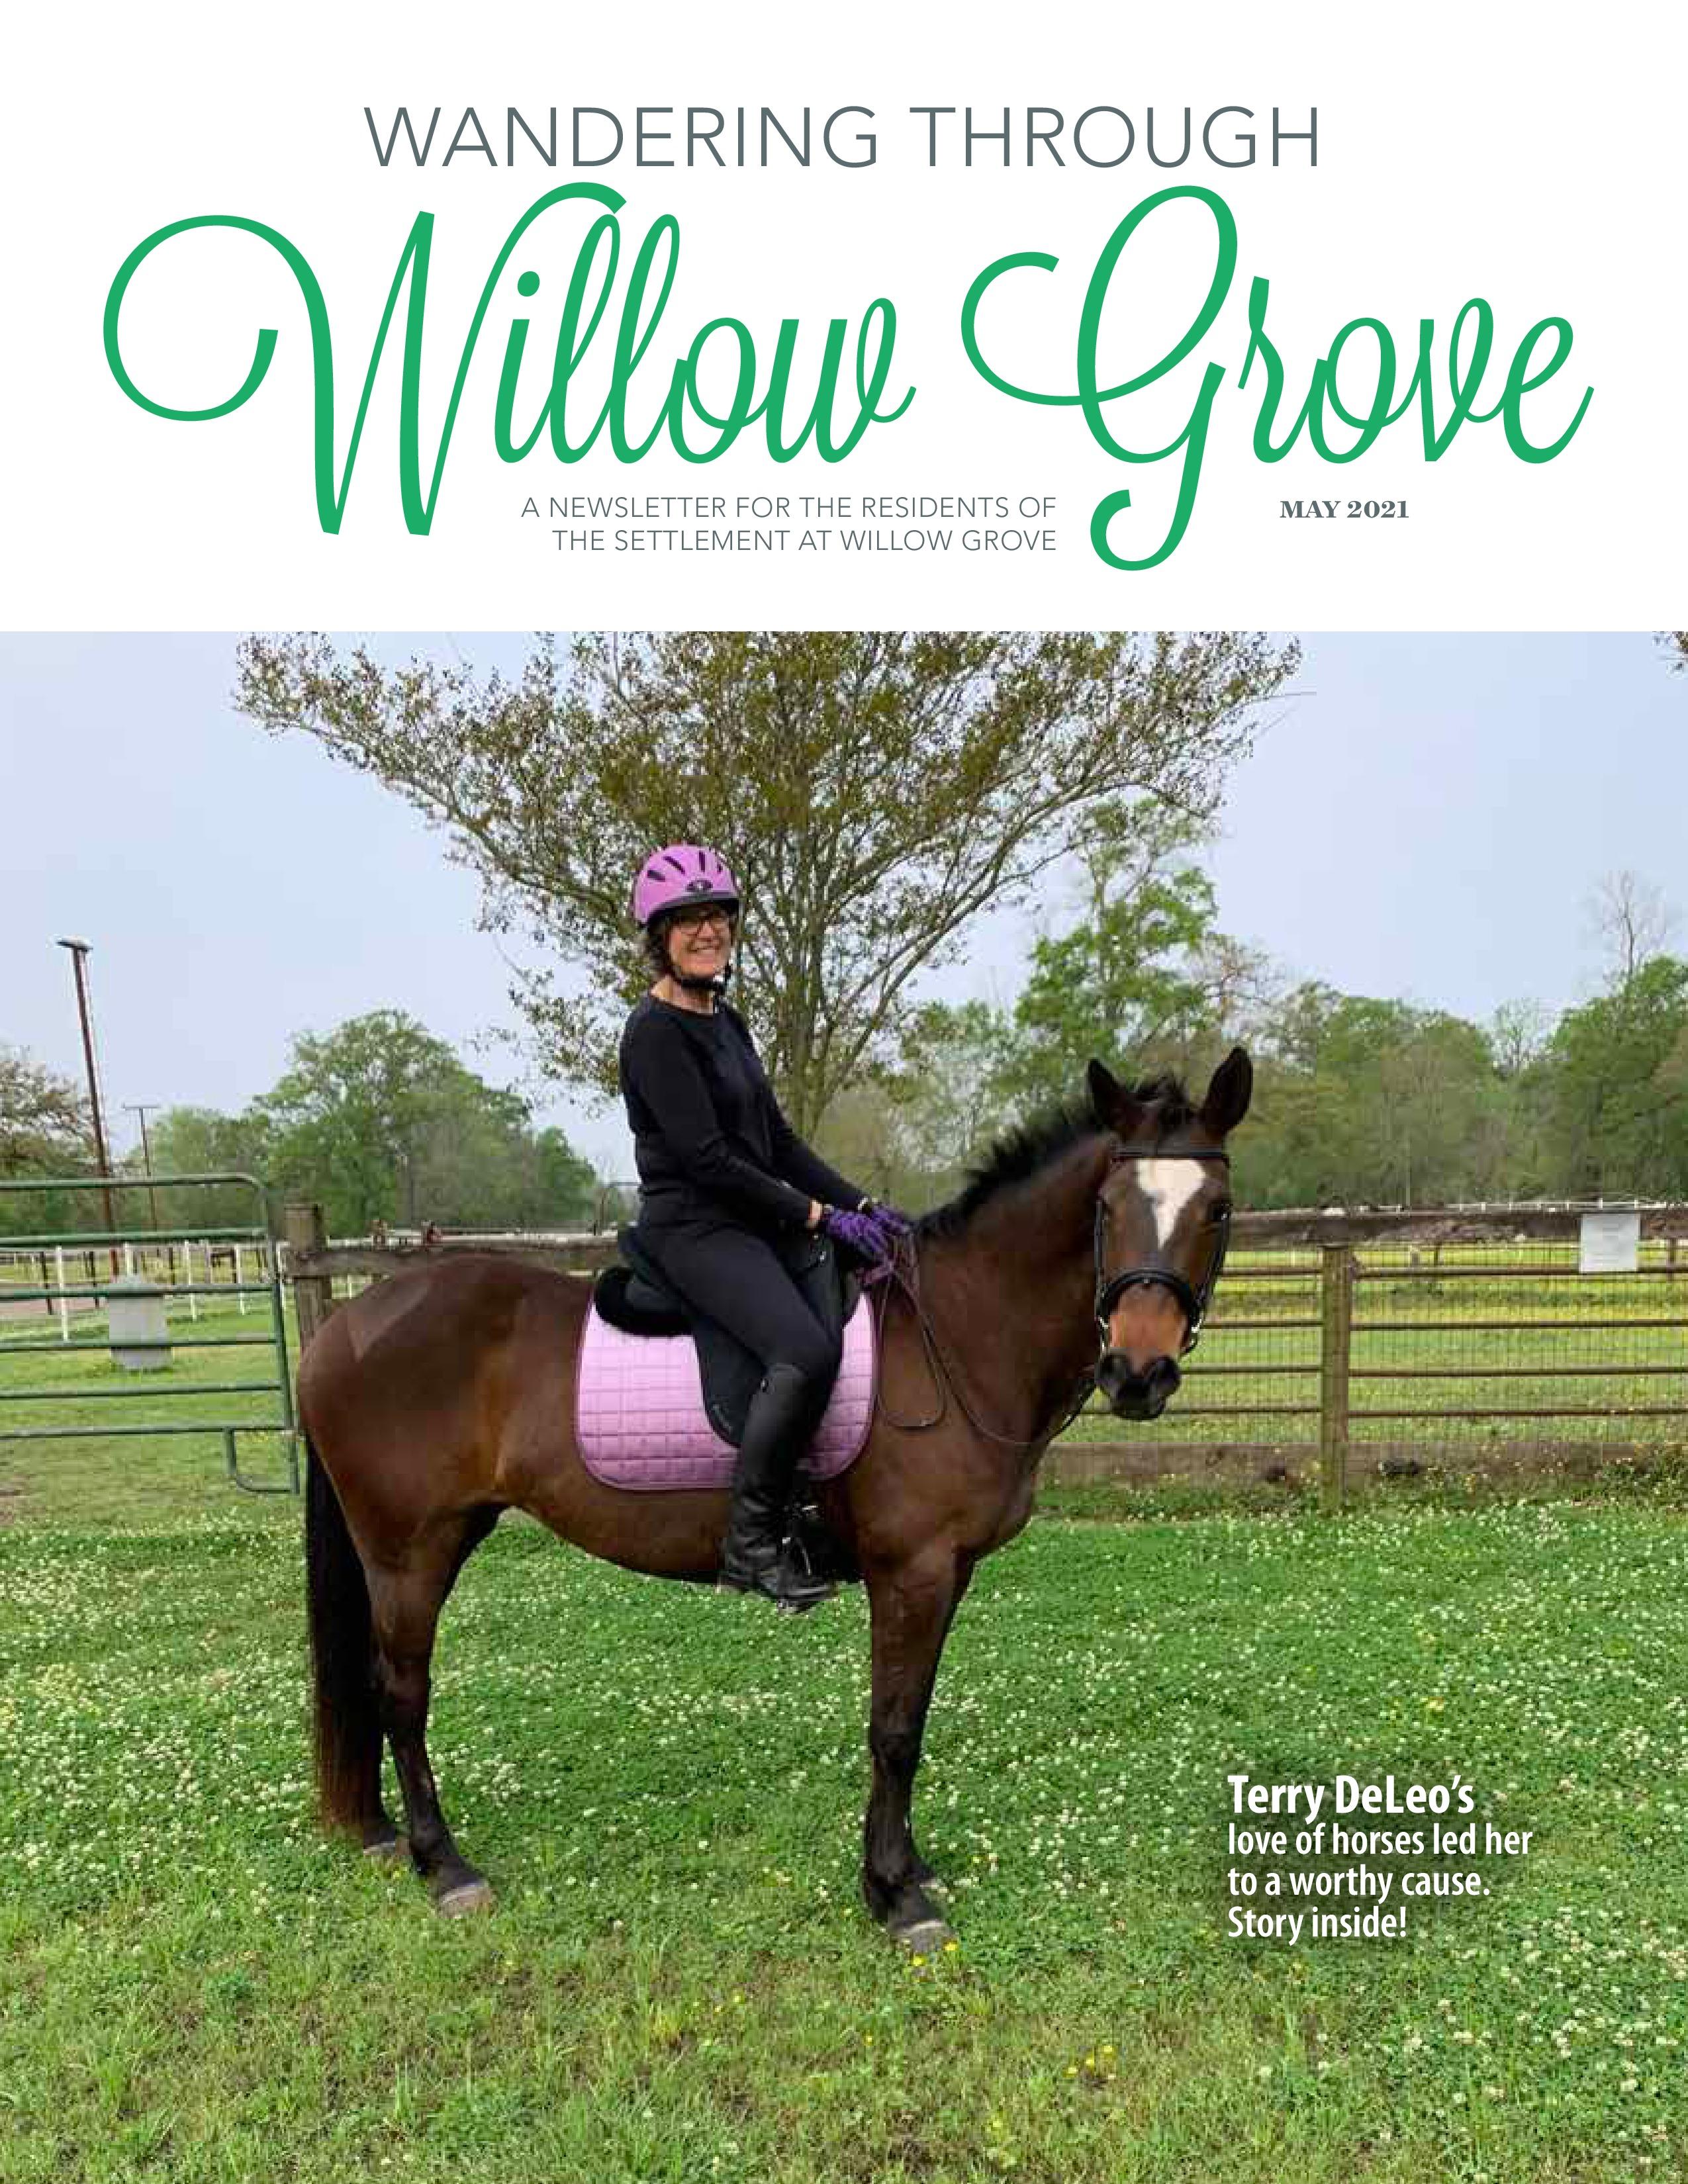 Wandering Through Willow Grove 2021-05-01